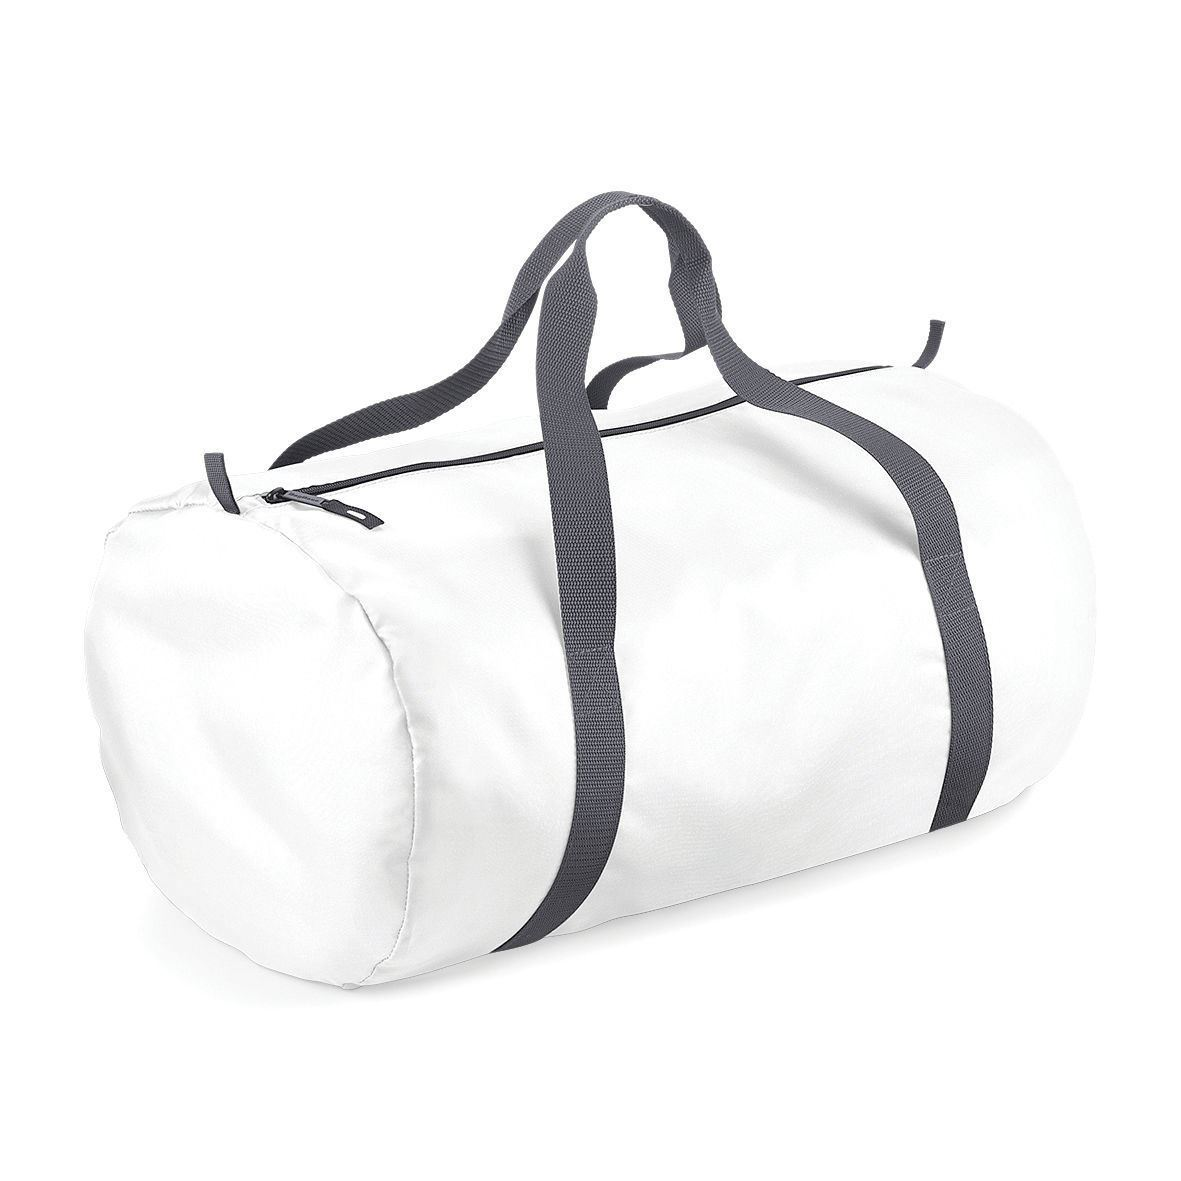 Bagbase Packaway Carry Barrel Bag Gym Dance School College Uni Travel Sports Bag